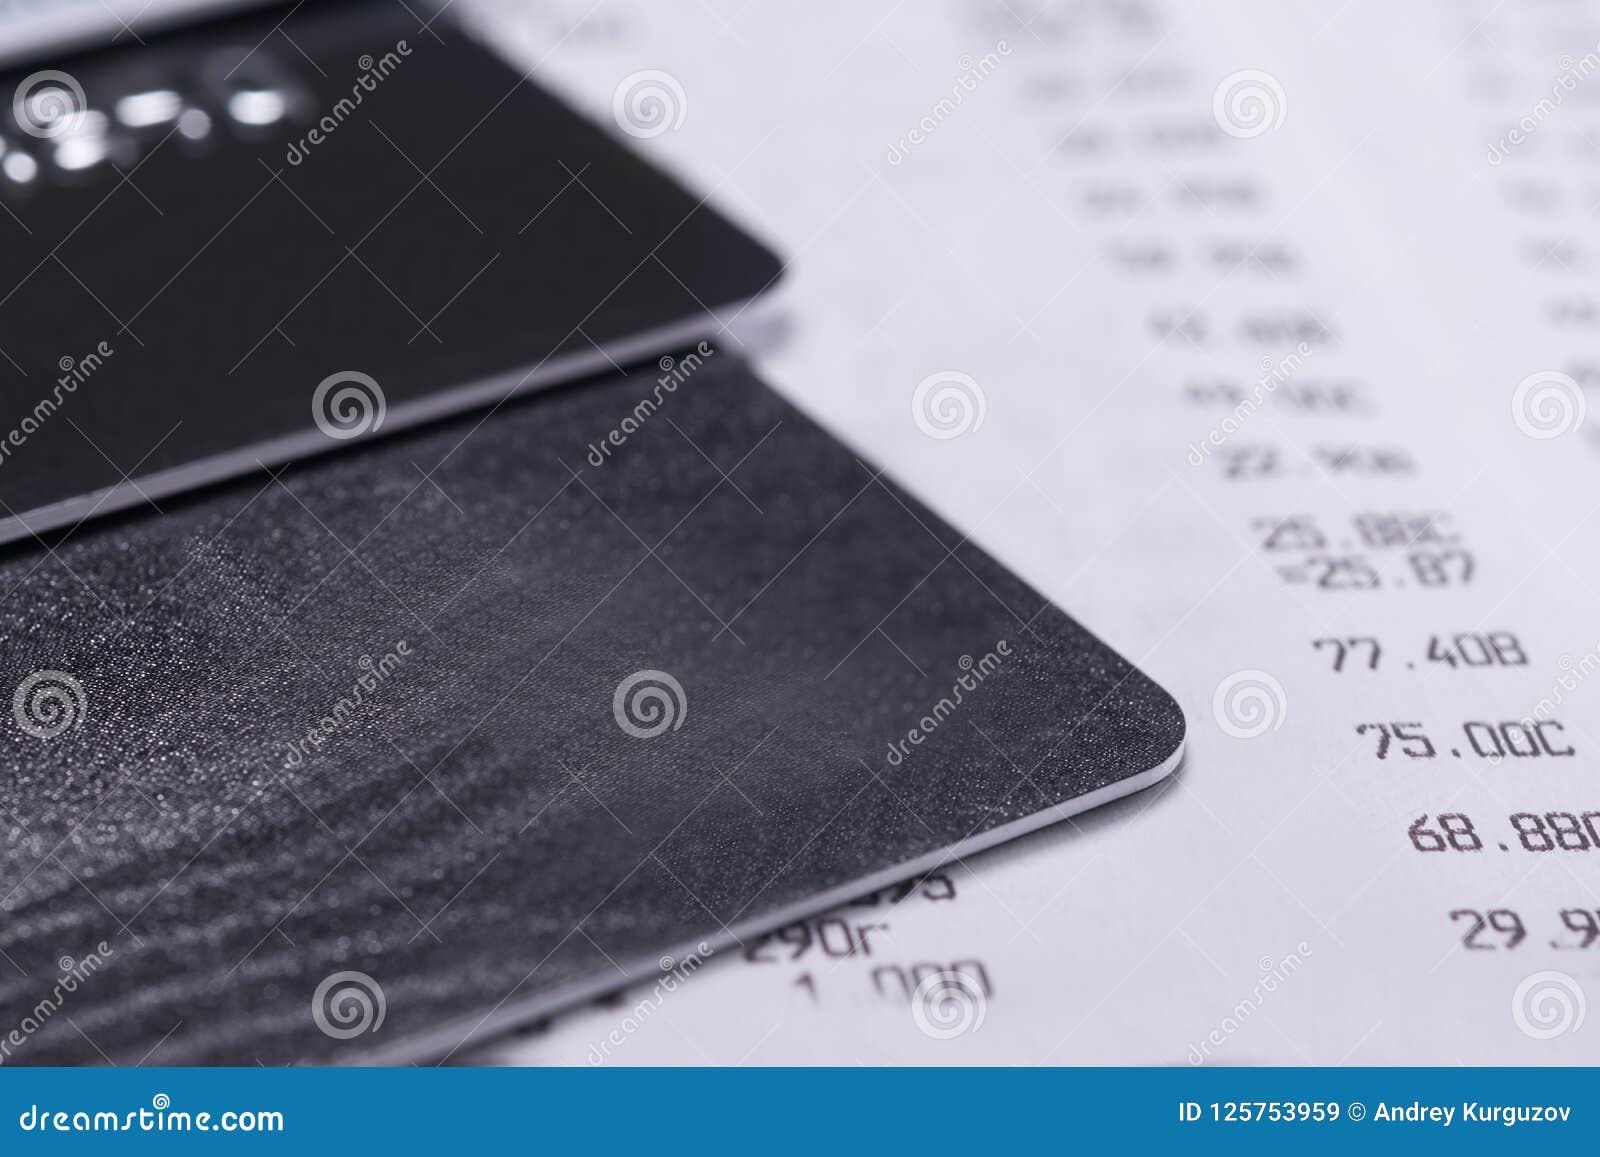 Карточки банка на продажи receipt от магазина, конца-вверх предпосылки